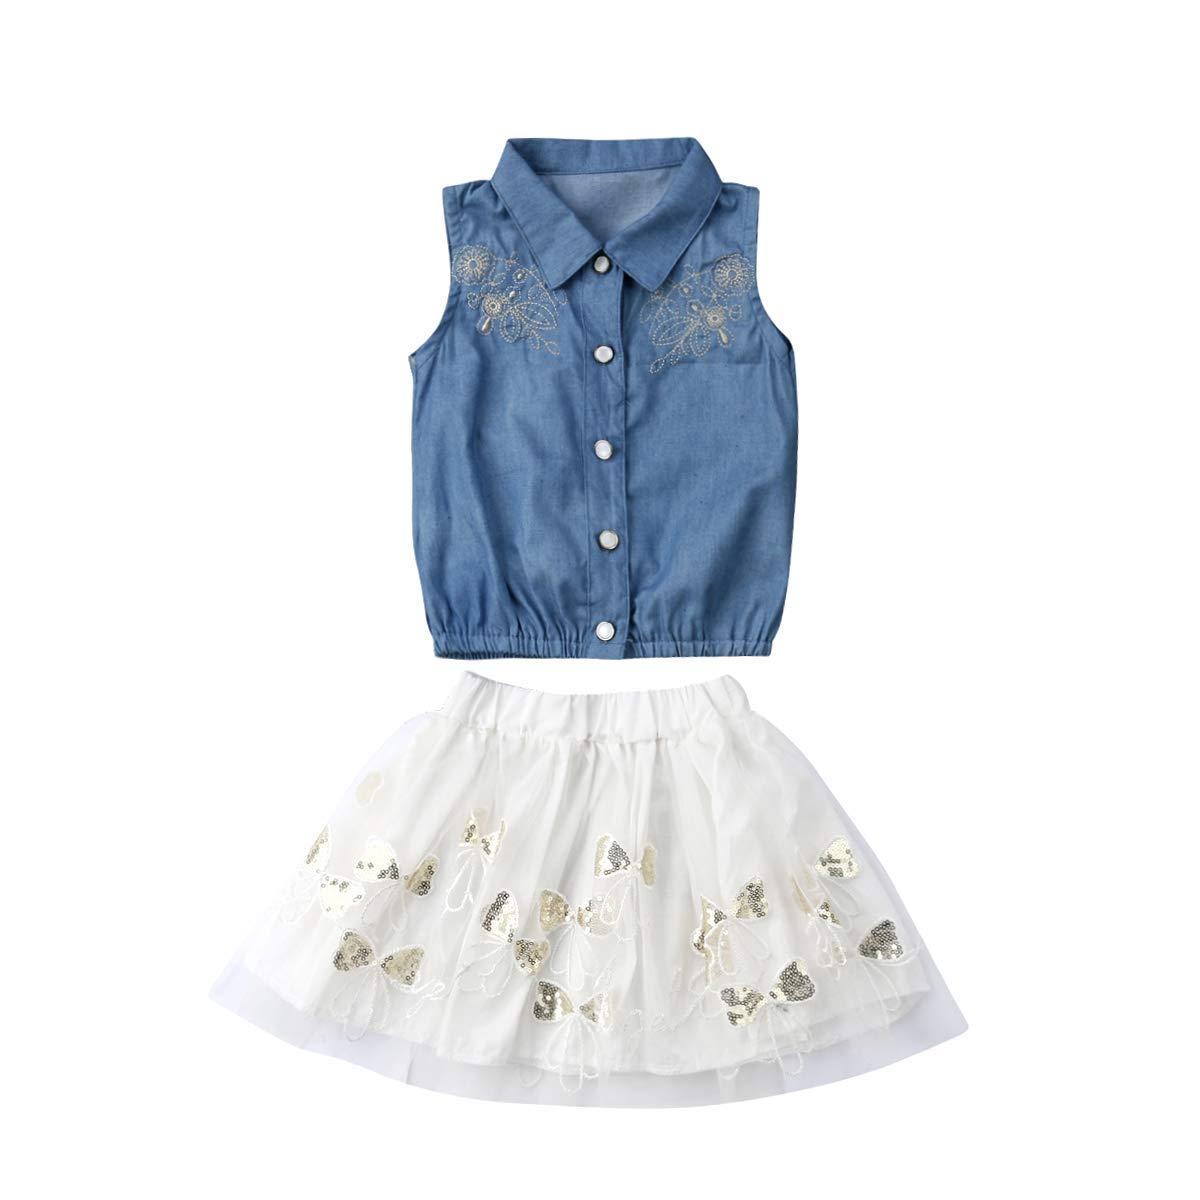 Toddler Kids Girls Collar Sleeveless Denim Shirt Tulle Lace Skirt Set 2Pcs Summer Clothes Sets